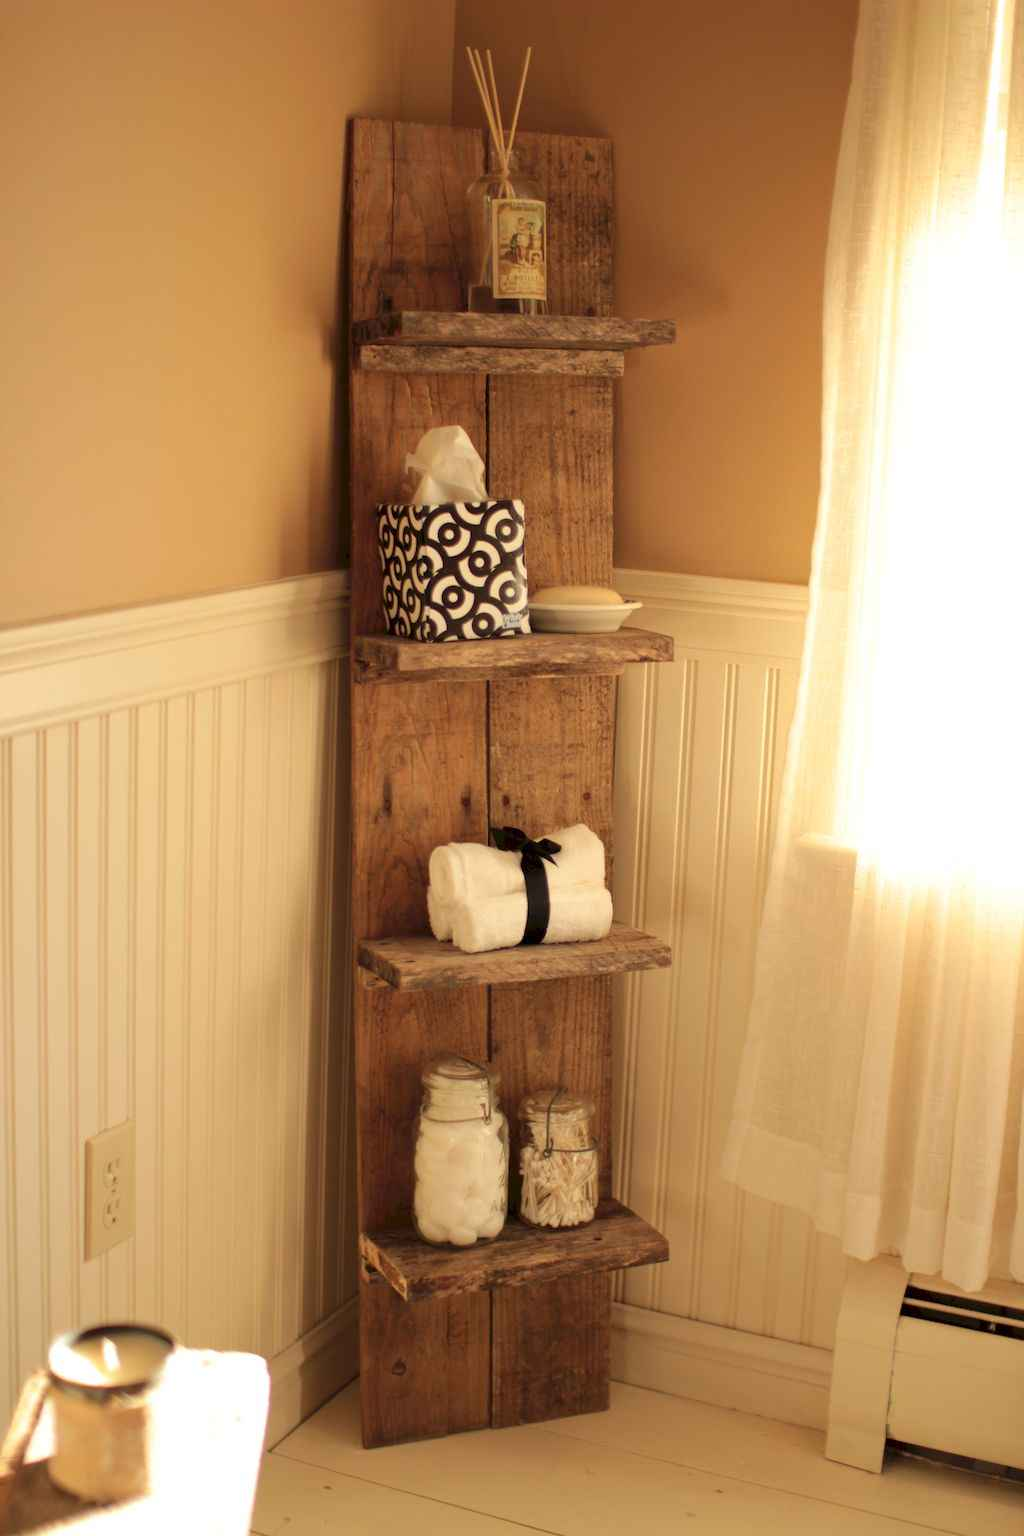 Cool bathroom storage shelves organization ideas (16)